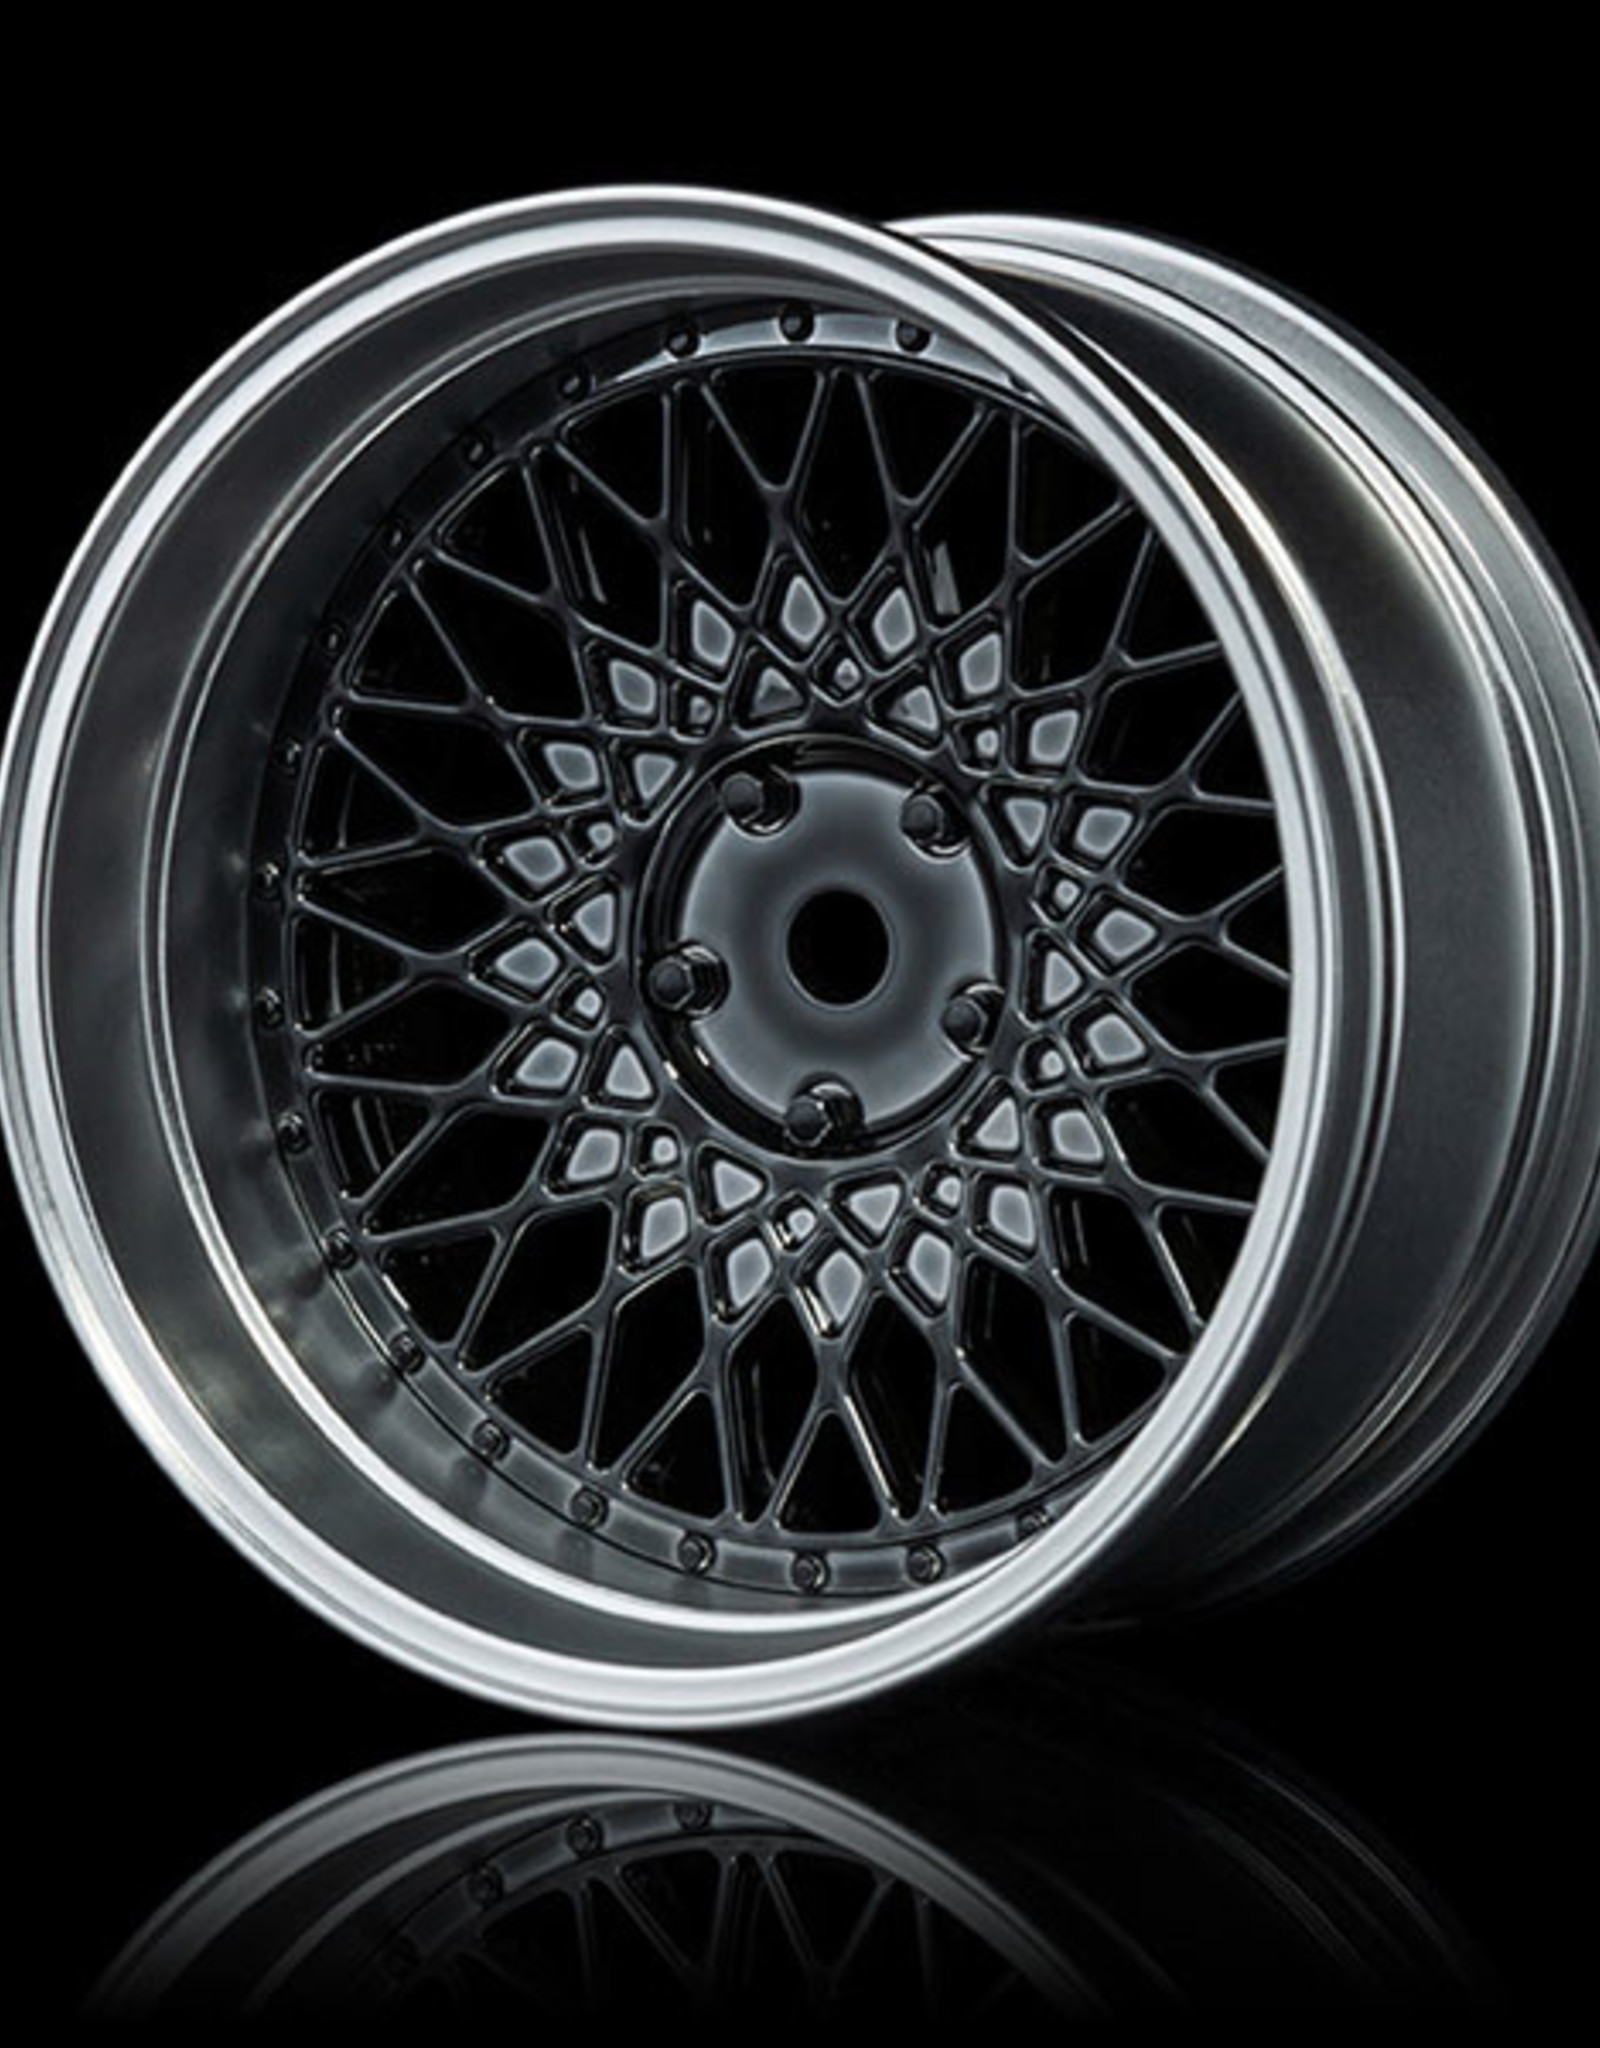 MST MXSPD102082SBK Silver Black 501